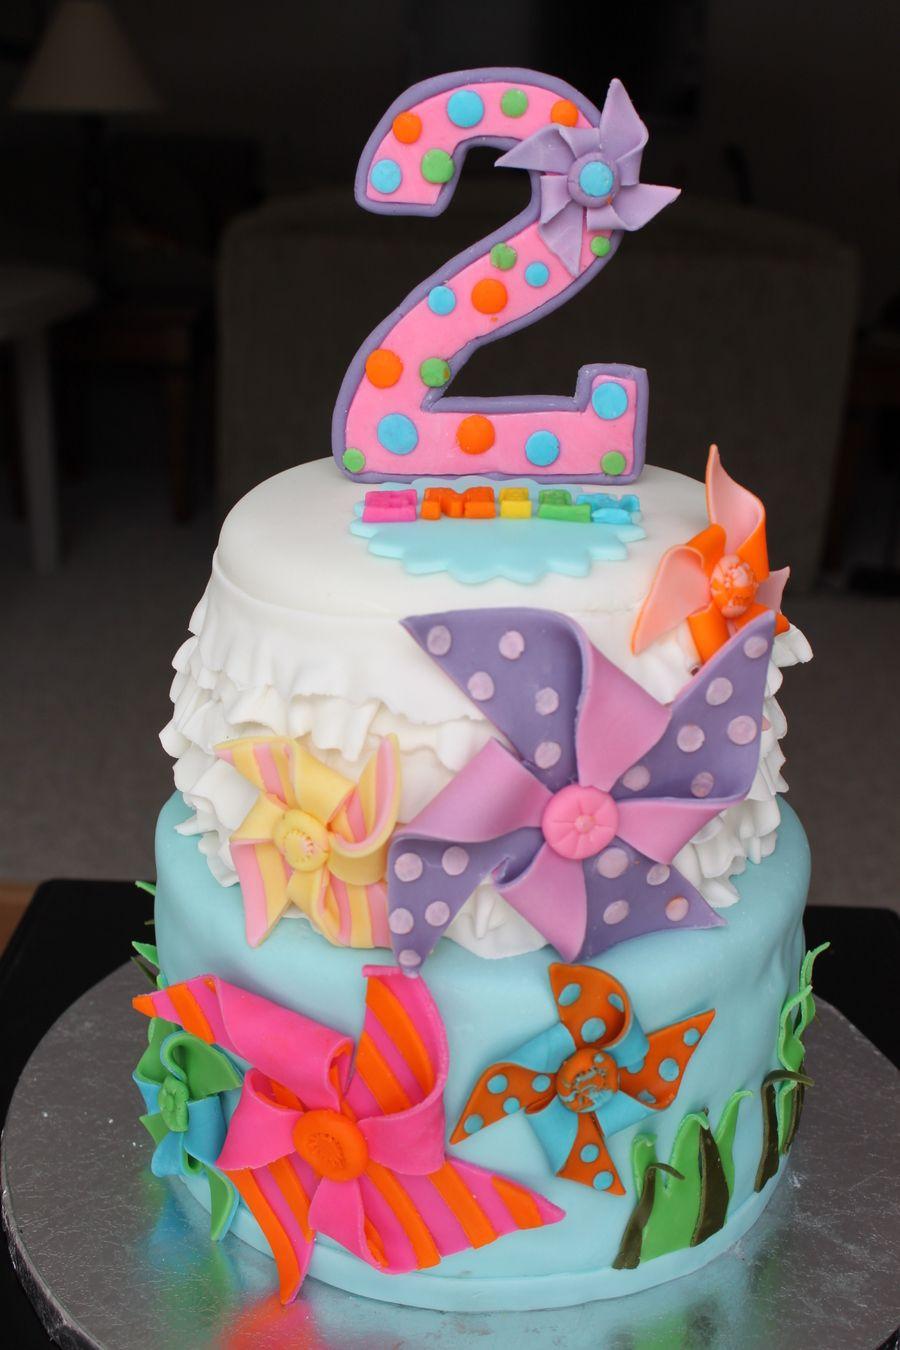 Lego Cake 2 year old birthday cake, Birthday cake with